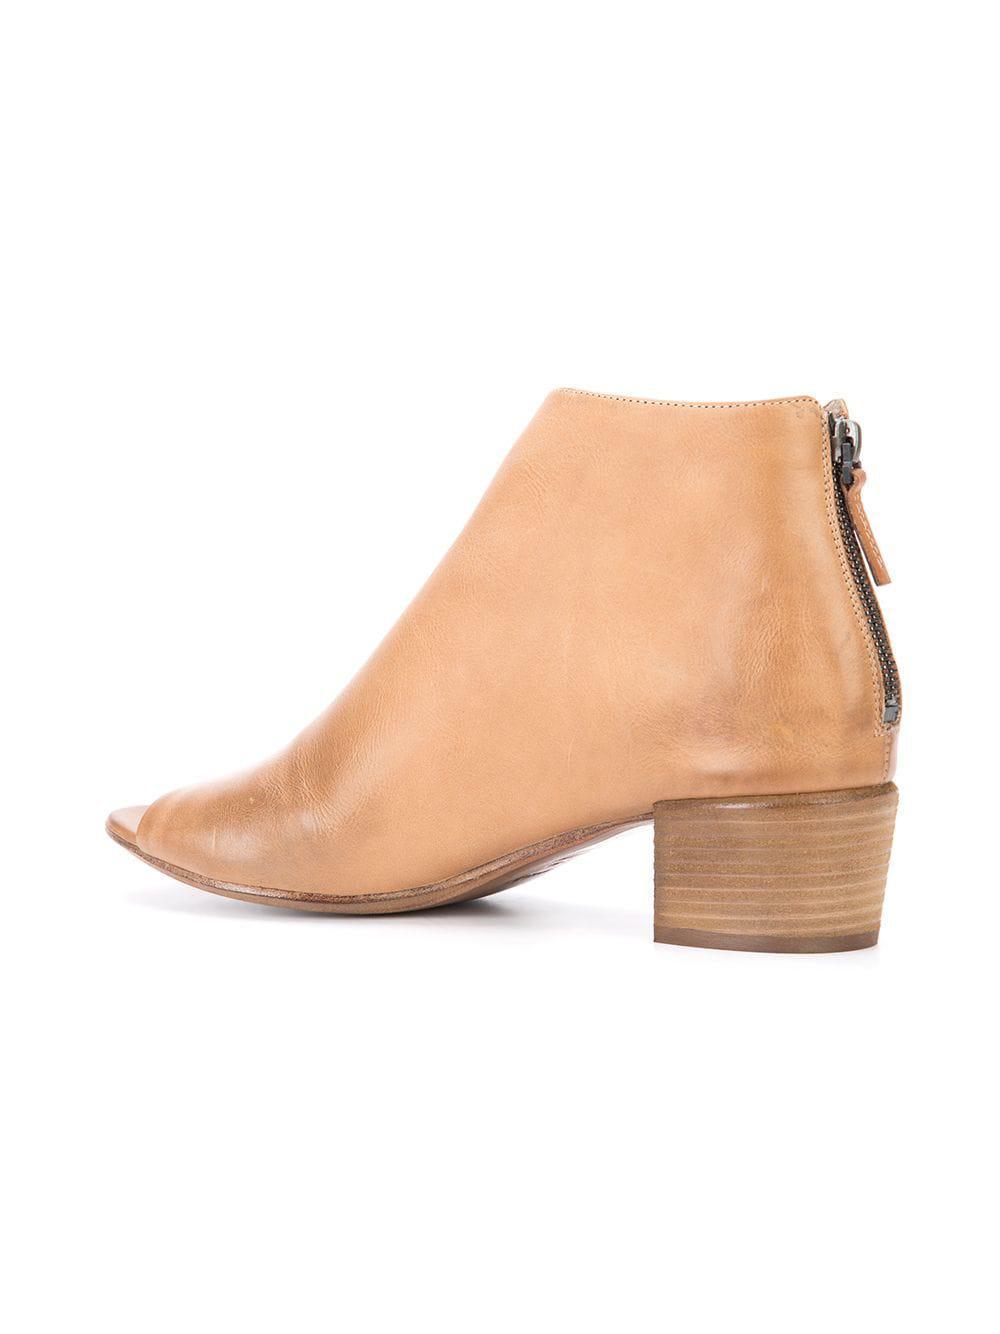 Boots Sandalo Marsèll Bo Lyst Tzqtv In Natural 6A7zTqTx